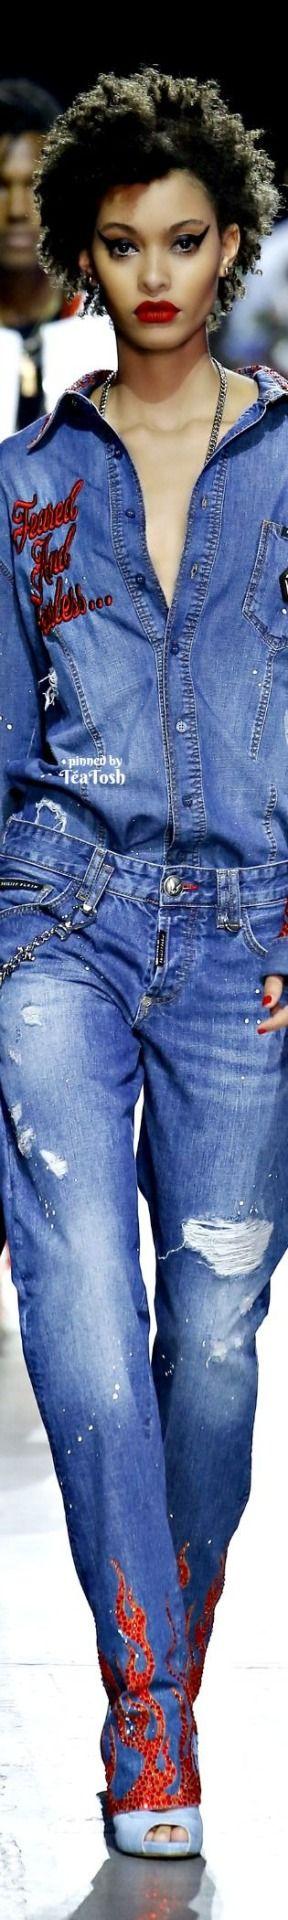 ❇Téa Tosh❇ Philipp Plein, Spring 2018, Menswear Collection